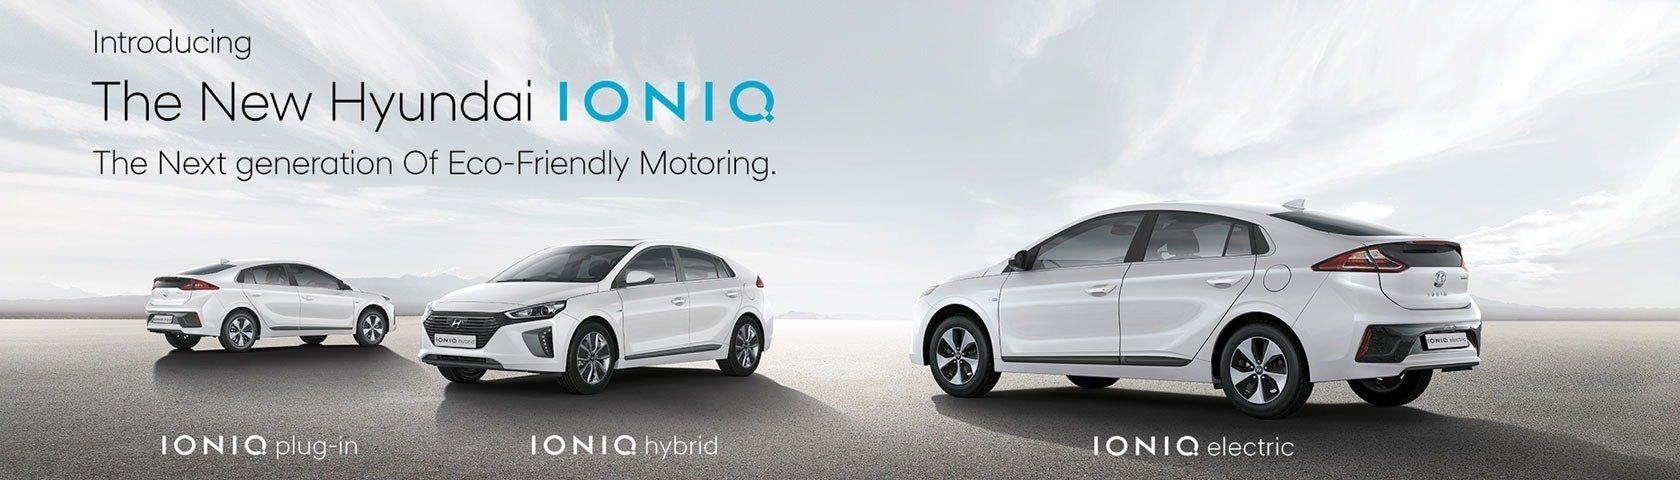 Hyundai IONIQ Dealer